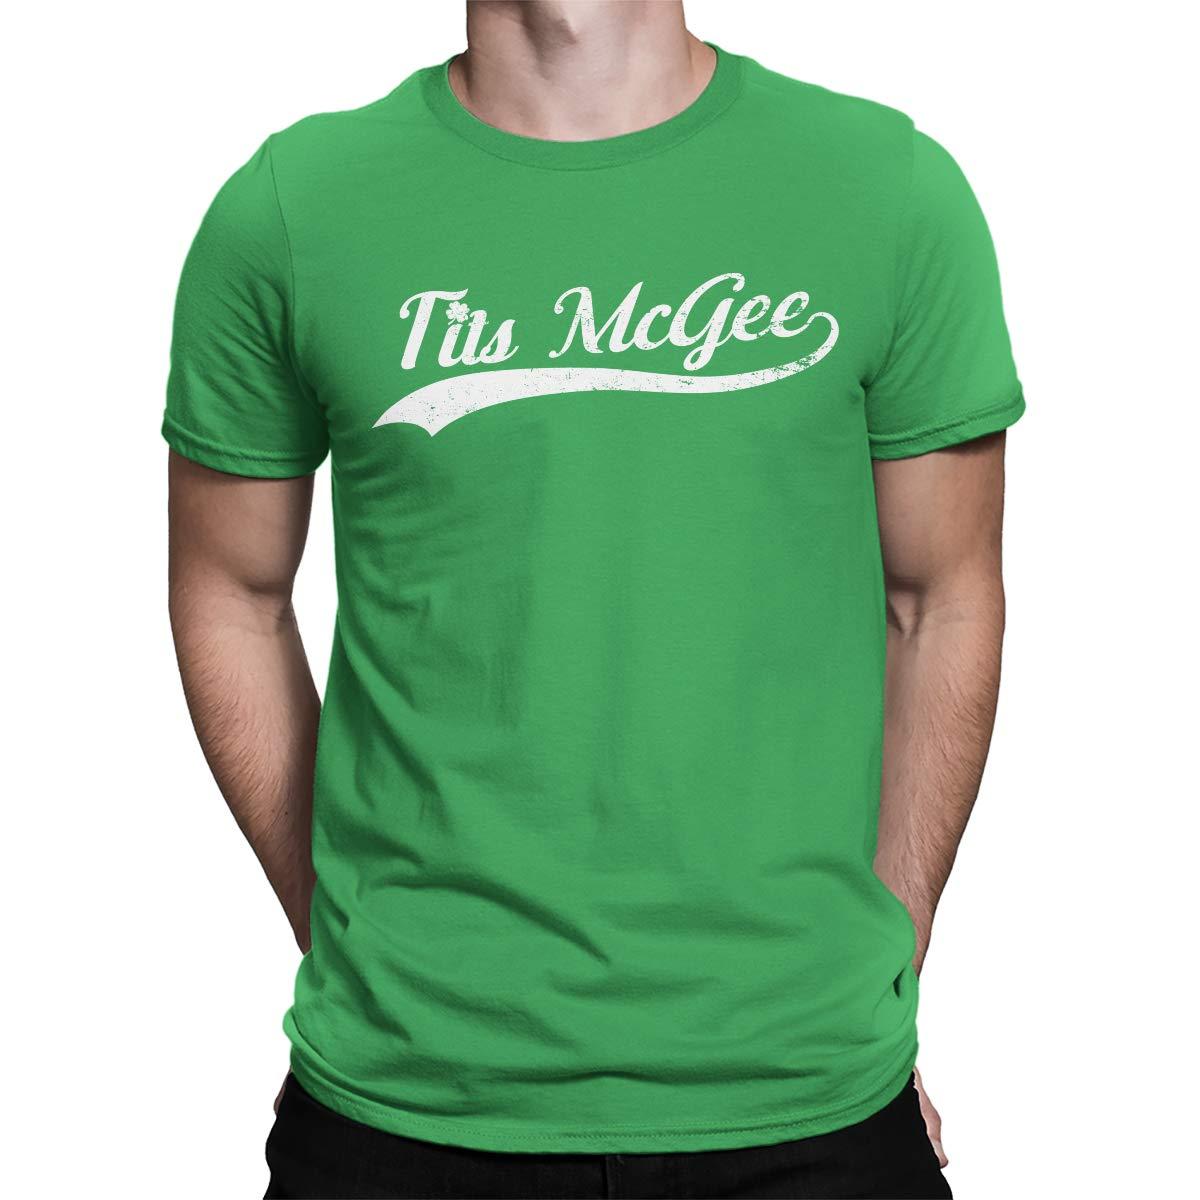 c99afc5d5 SpiritForged Apparel Tits McGee Men's T-Shirt, Kelly XL